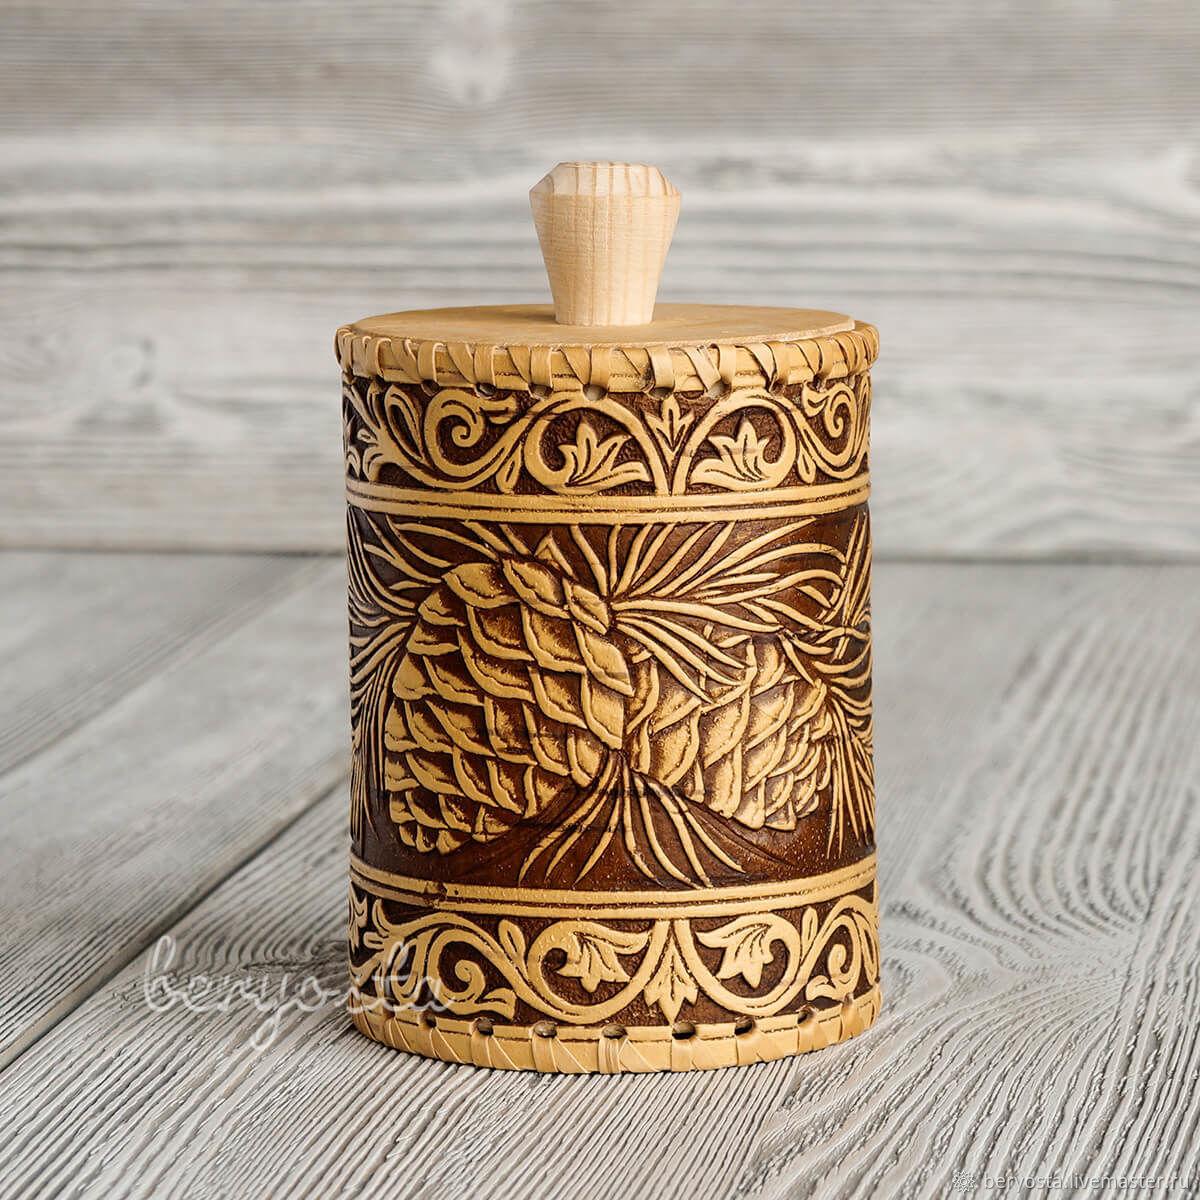 Birch tuesok 'Cone' 8h11 cm. Jar from clay, Jars, Novosibirsk,  Фото №1